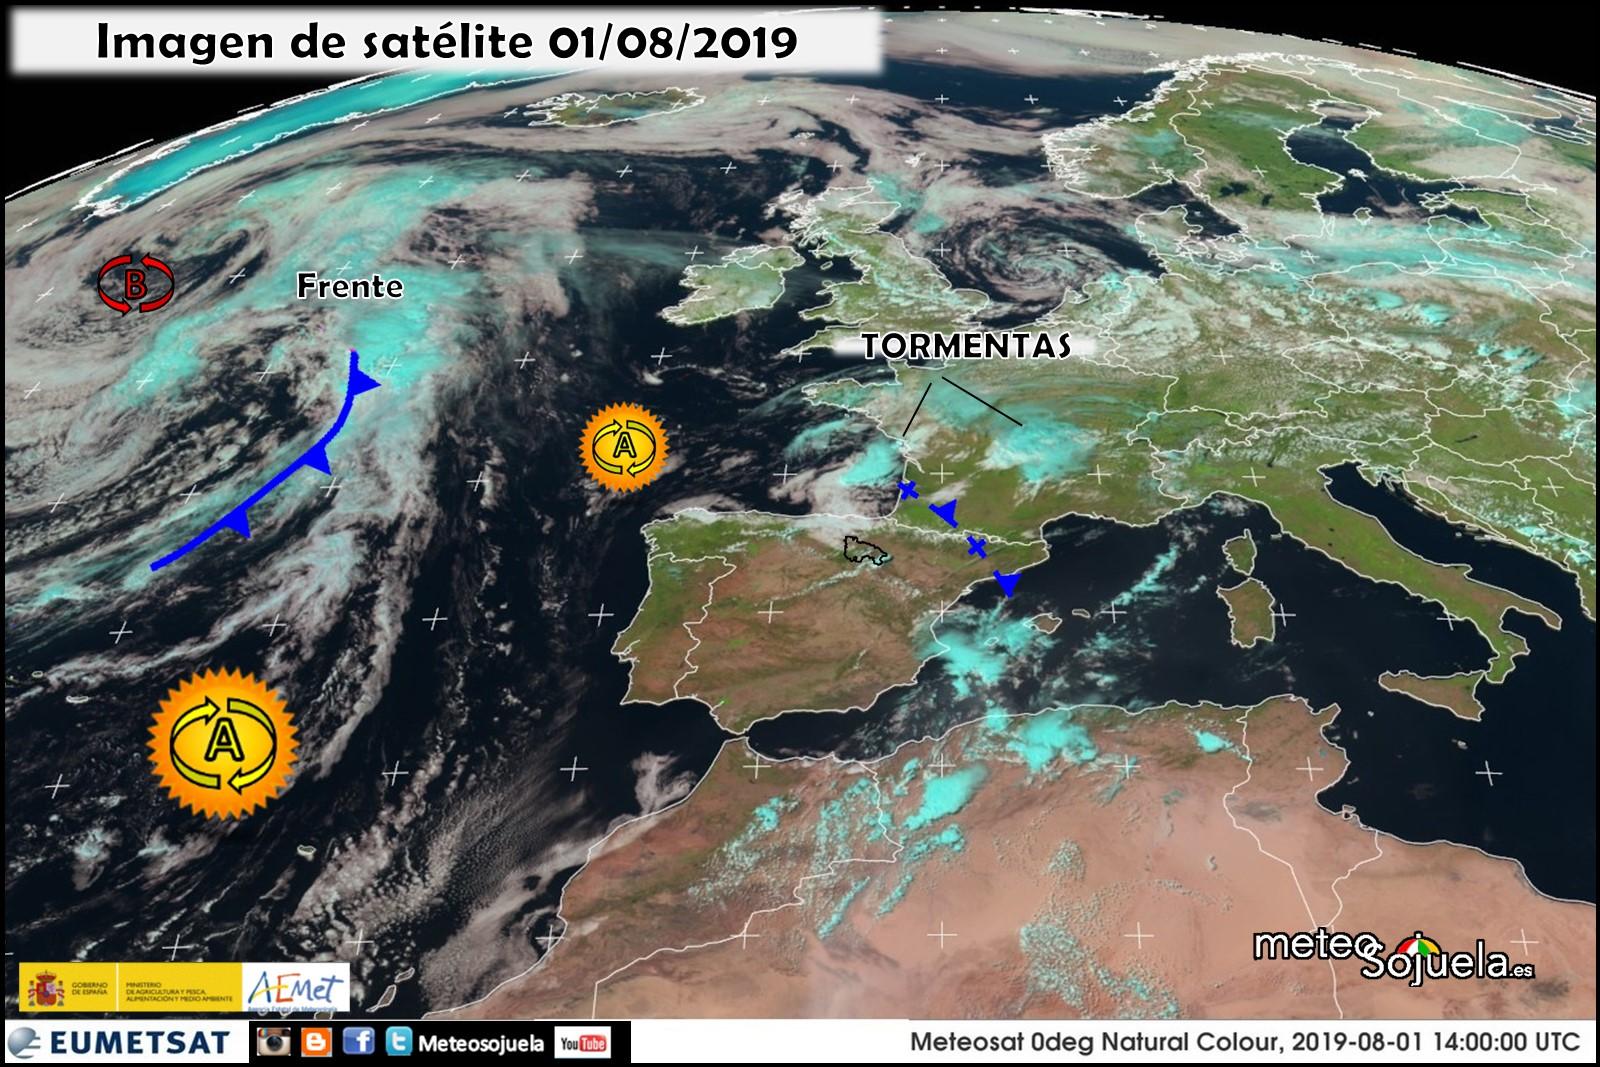 Imágen de satélite Eumetsat. Meteosojuela.es